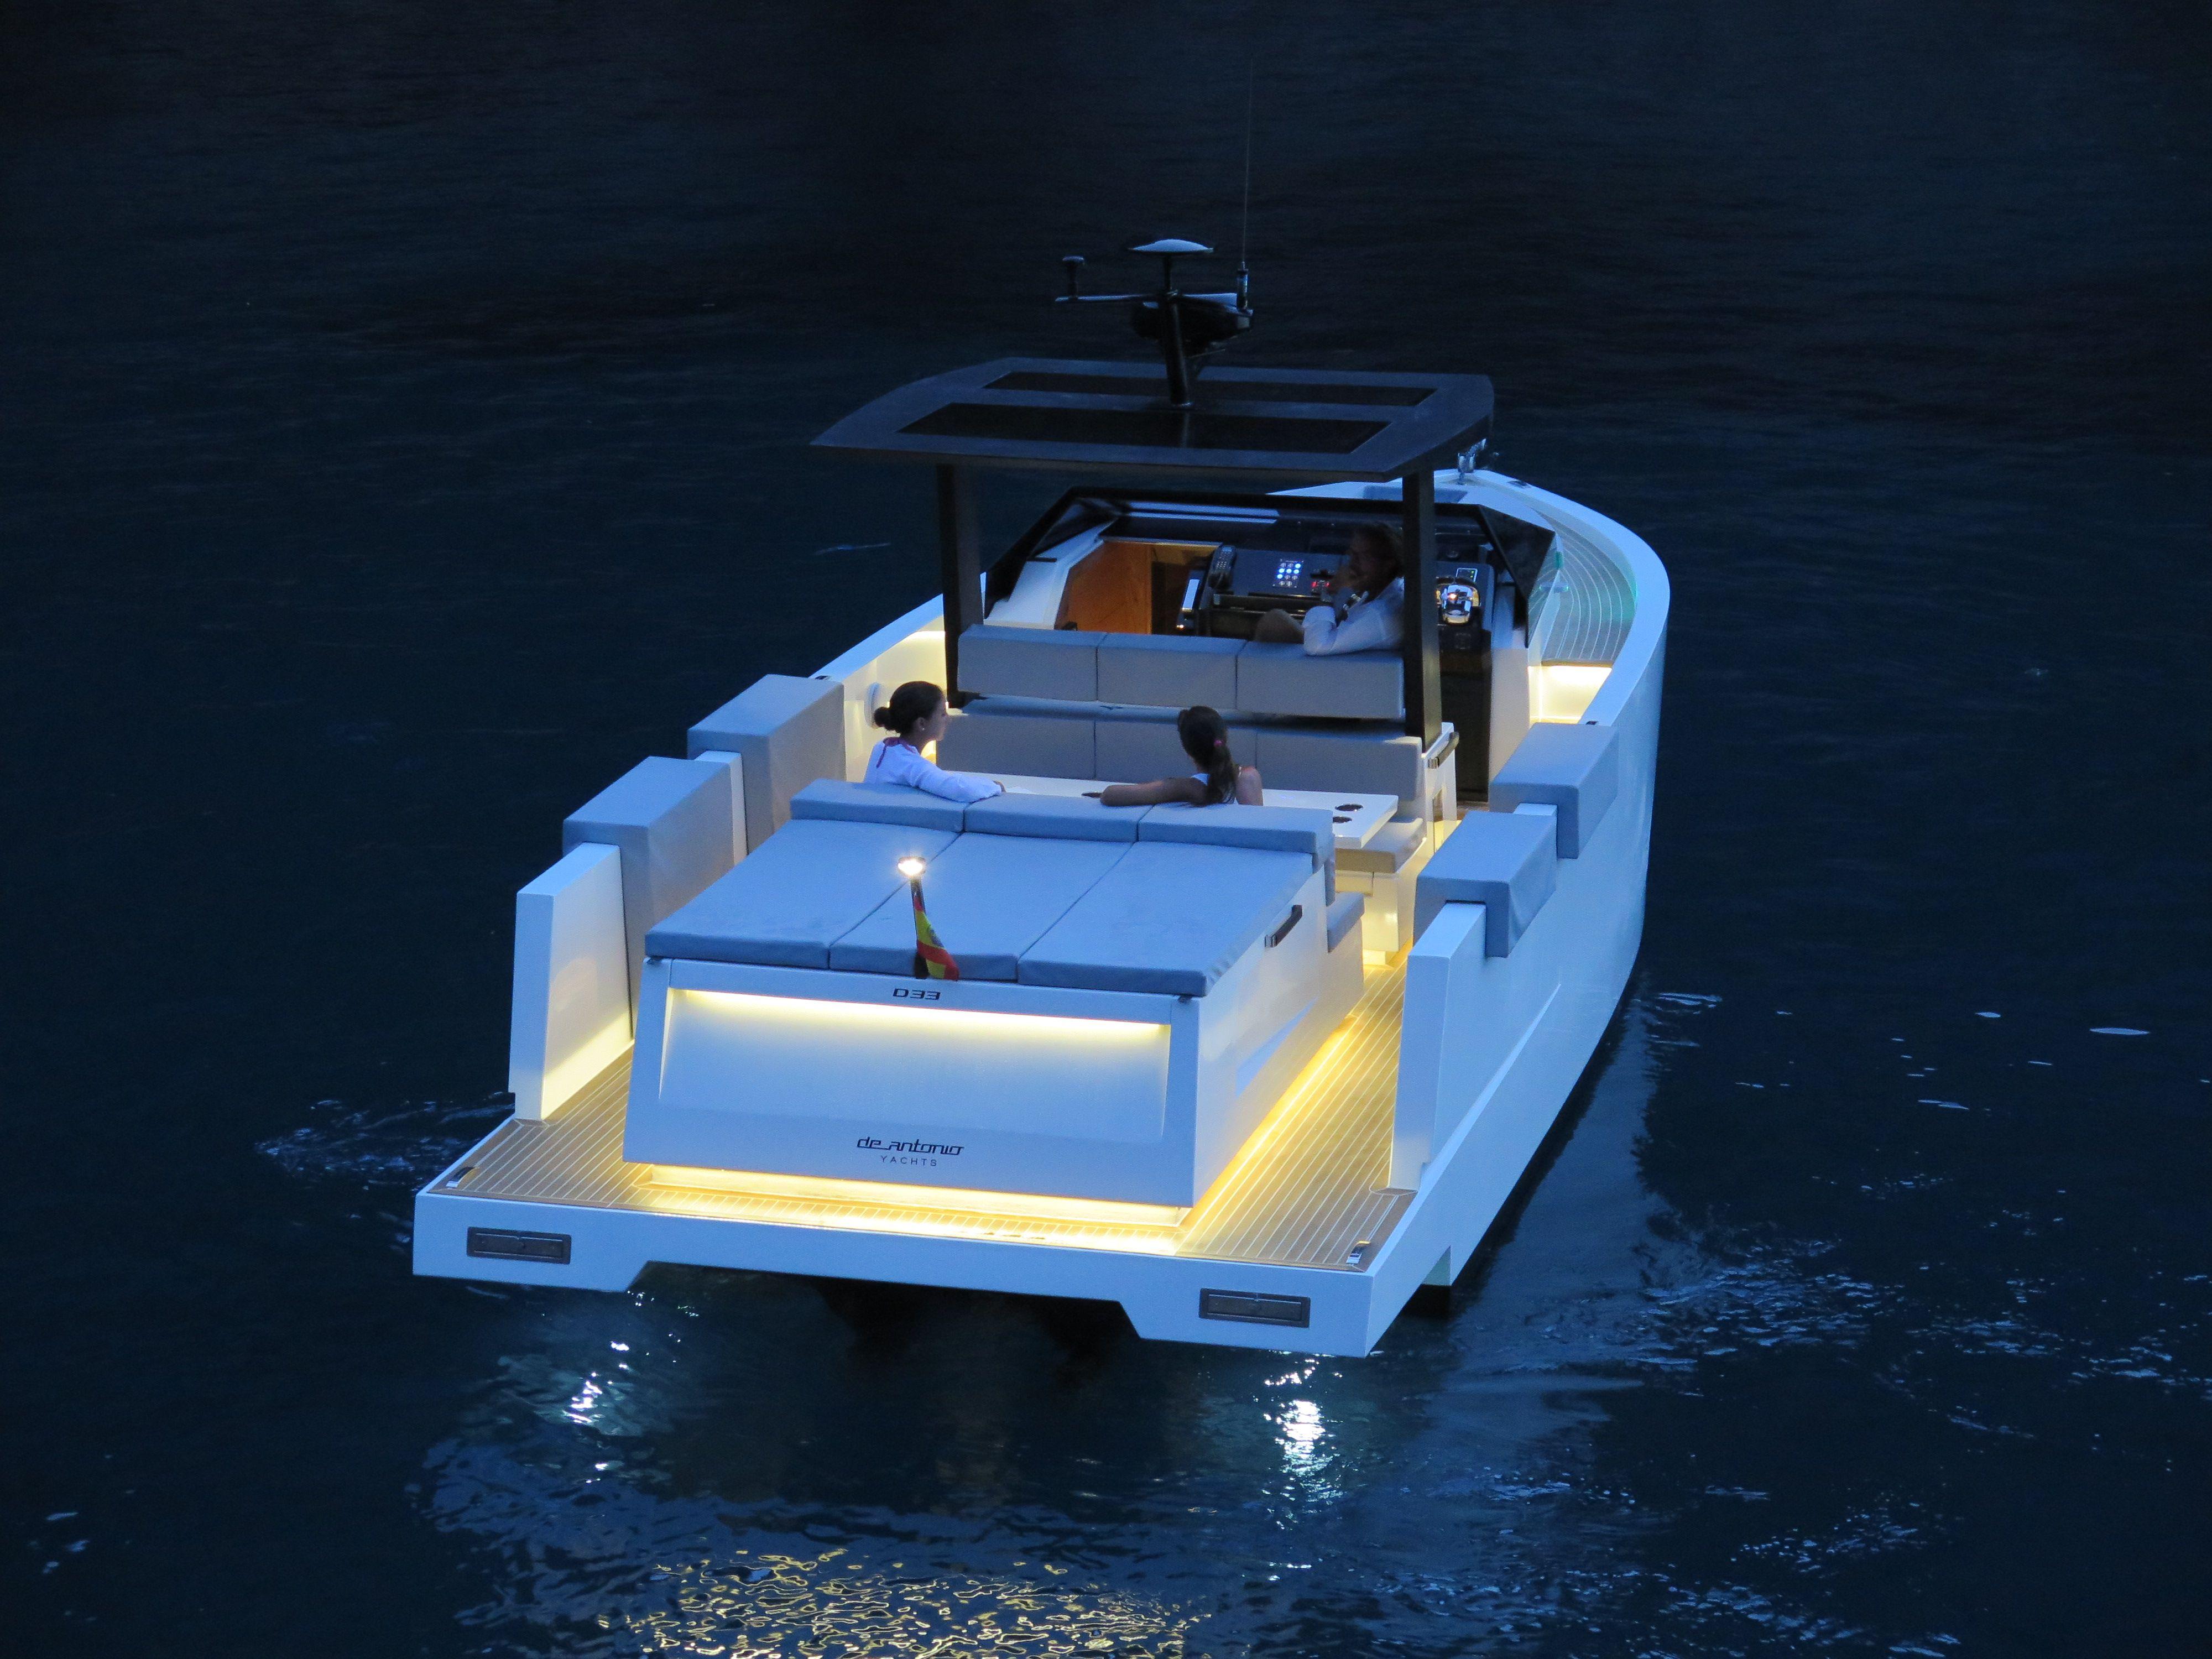 De antonio yachts d lighting design by ubica id cool shit